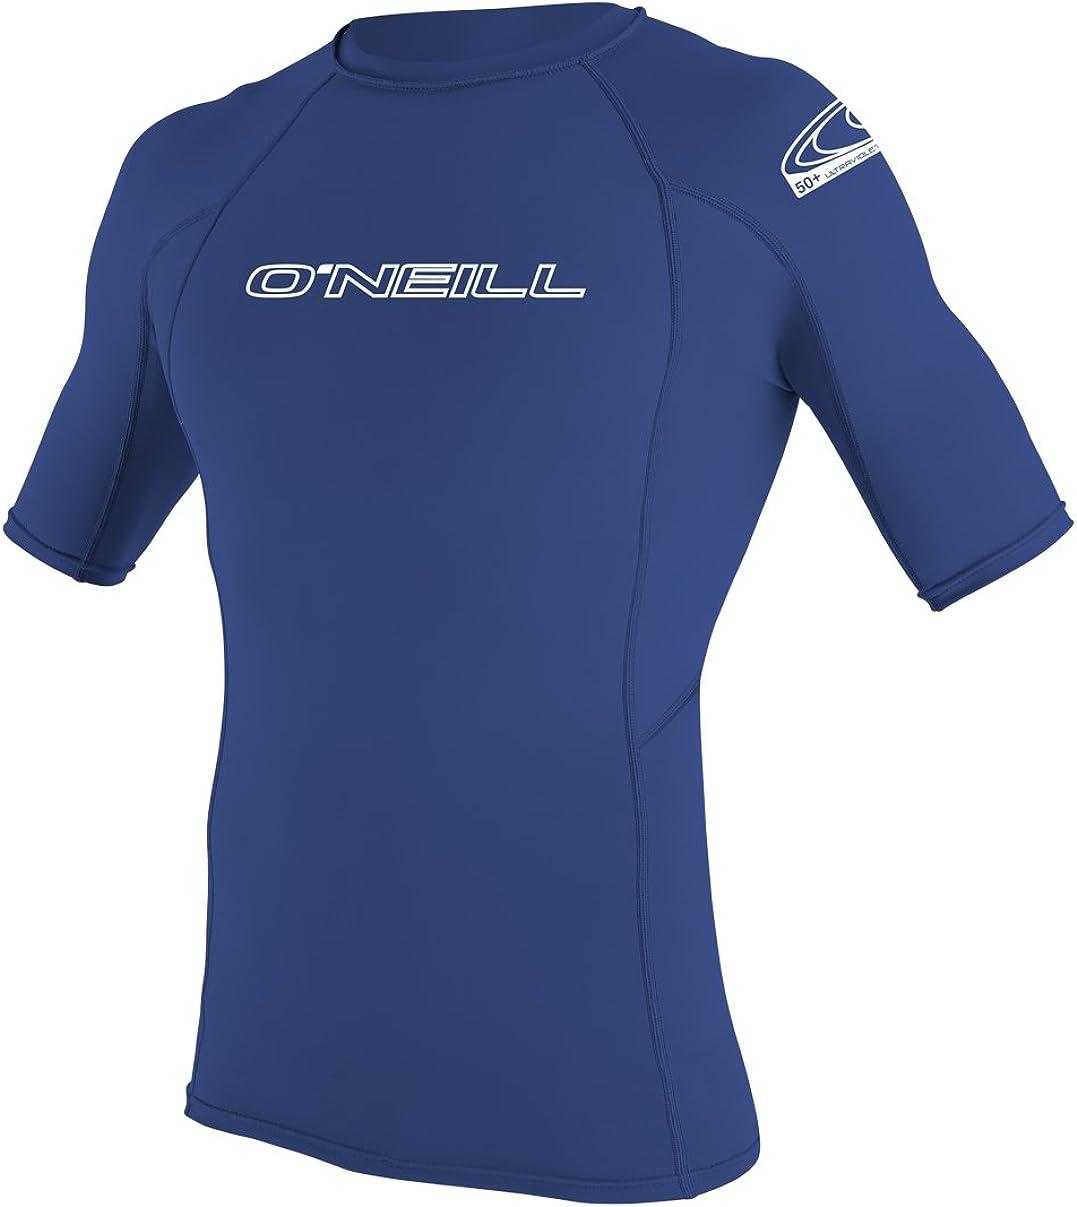 O'Neill Men's Basic Skins UPF 50+ Short Sleeve Rash Guard: Clothing